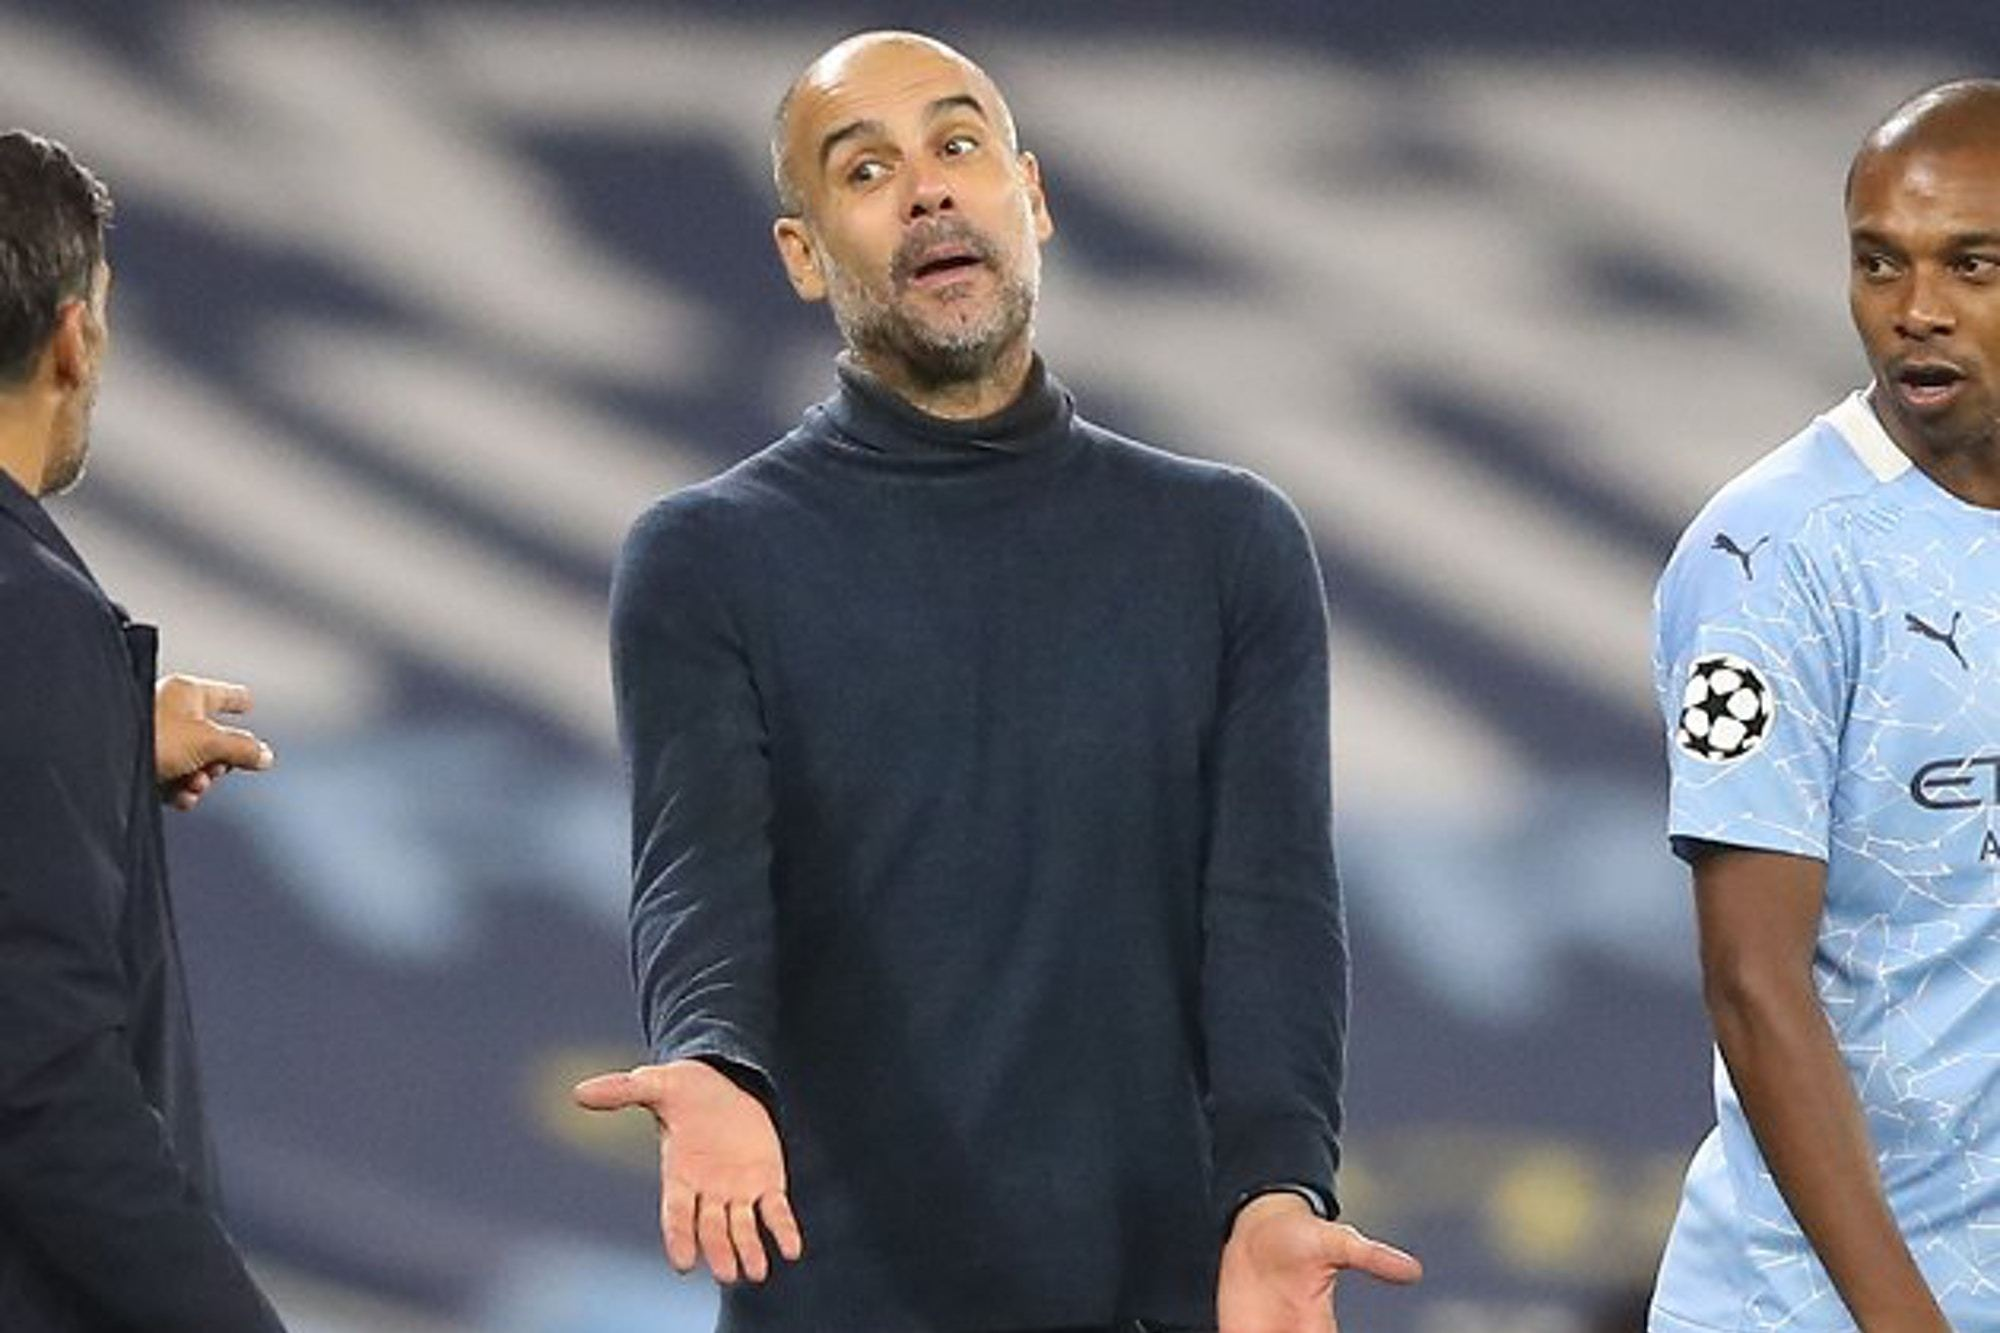 Thắng to Wolves, Pep Guardiola réo gọi MU